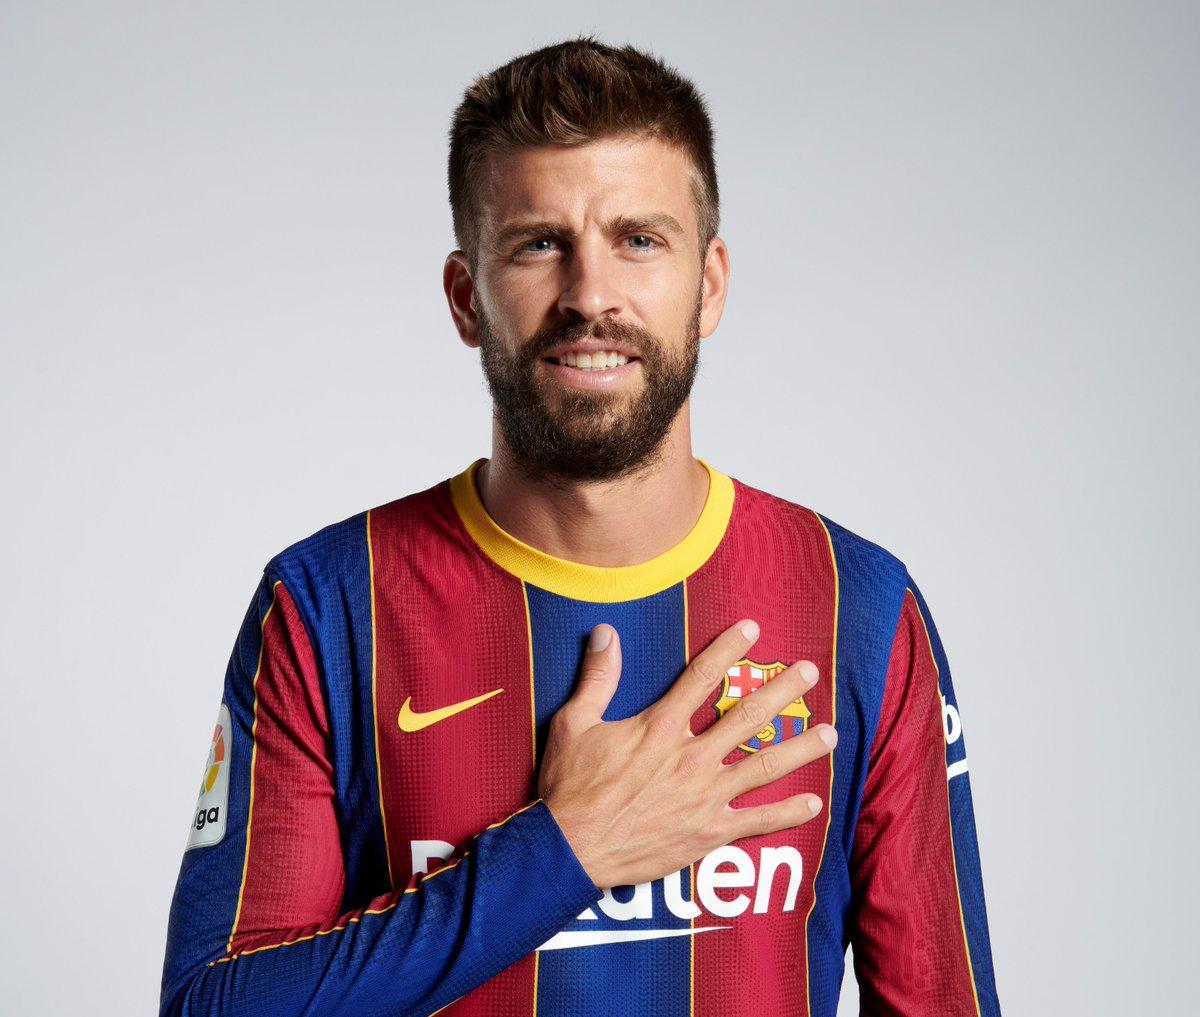 RT @FCBarcelona: Get well soon, @3gerardpique 💪💙❤️ https://t.co/vIK0AOKW7E